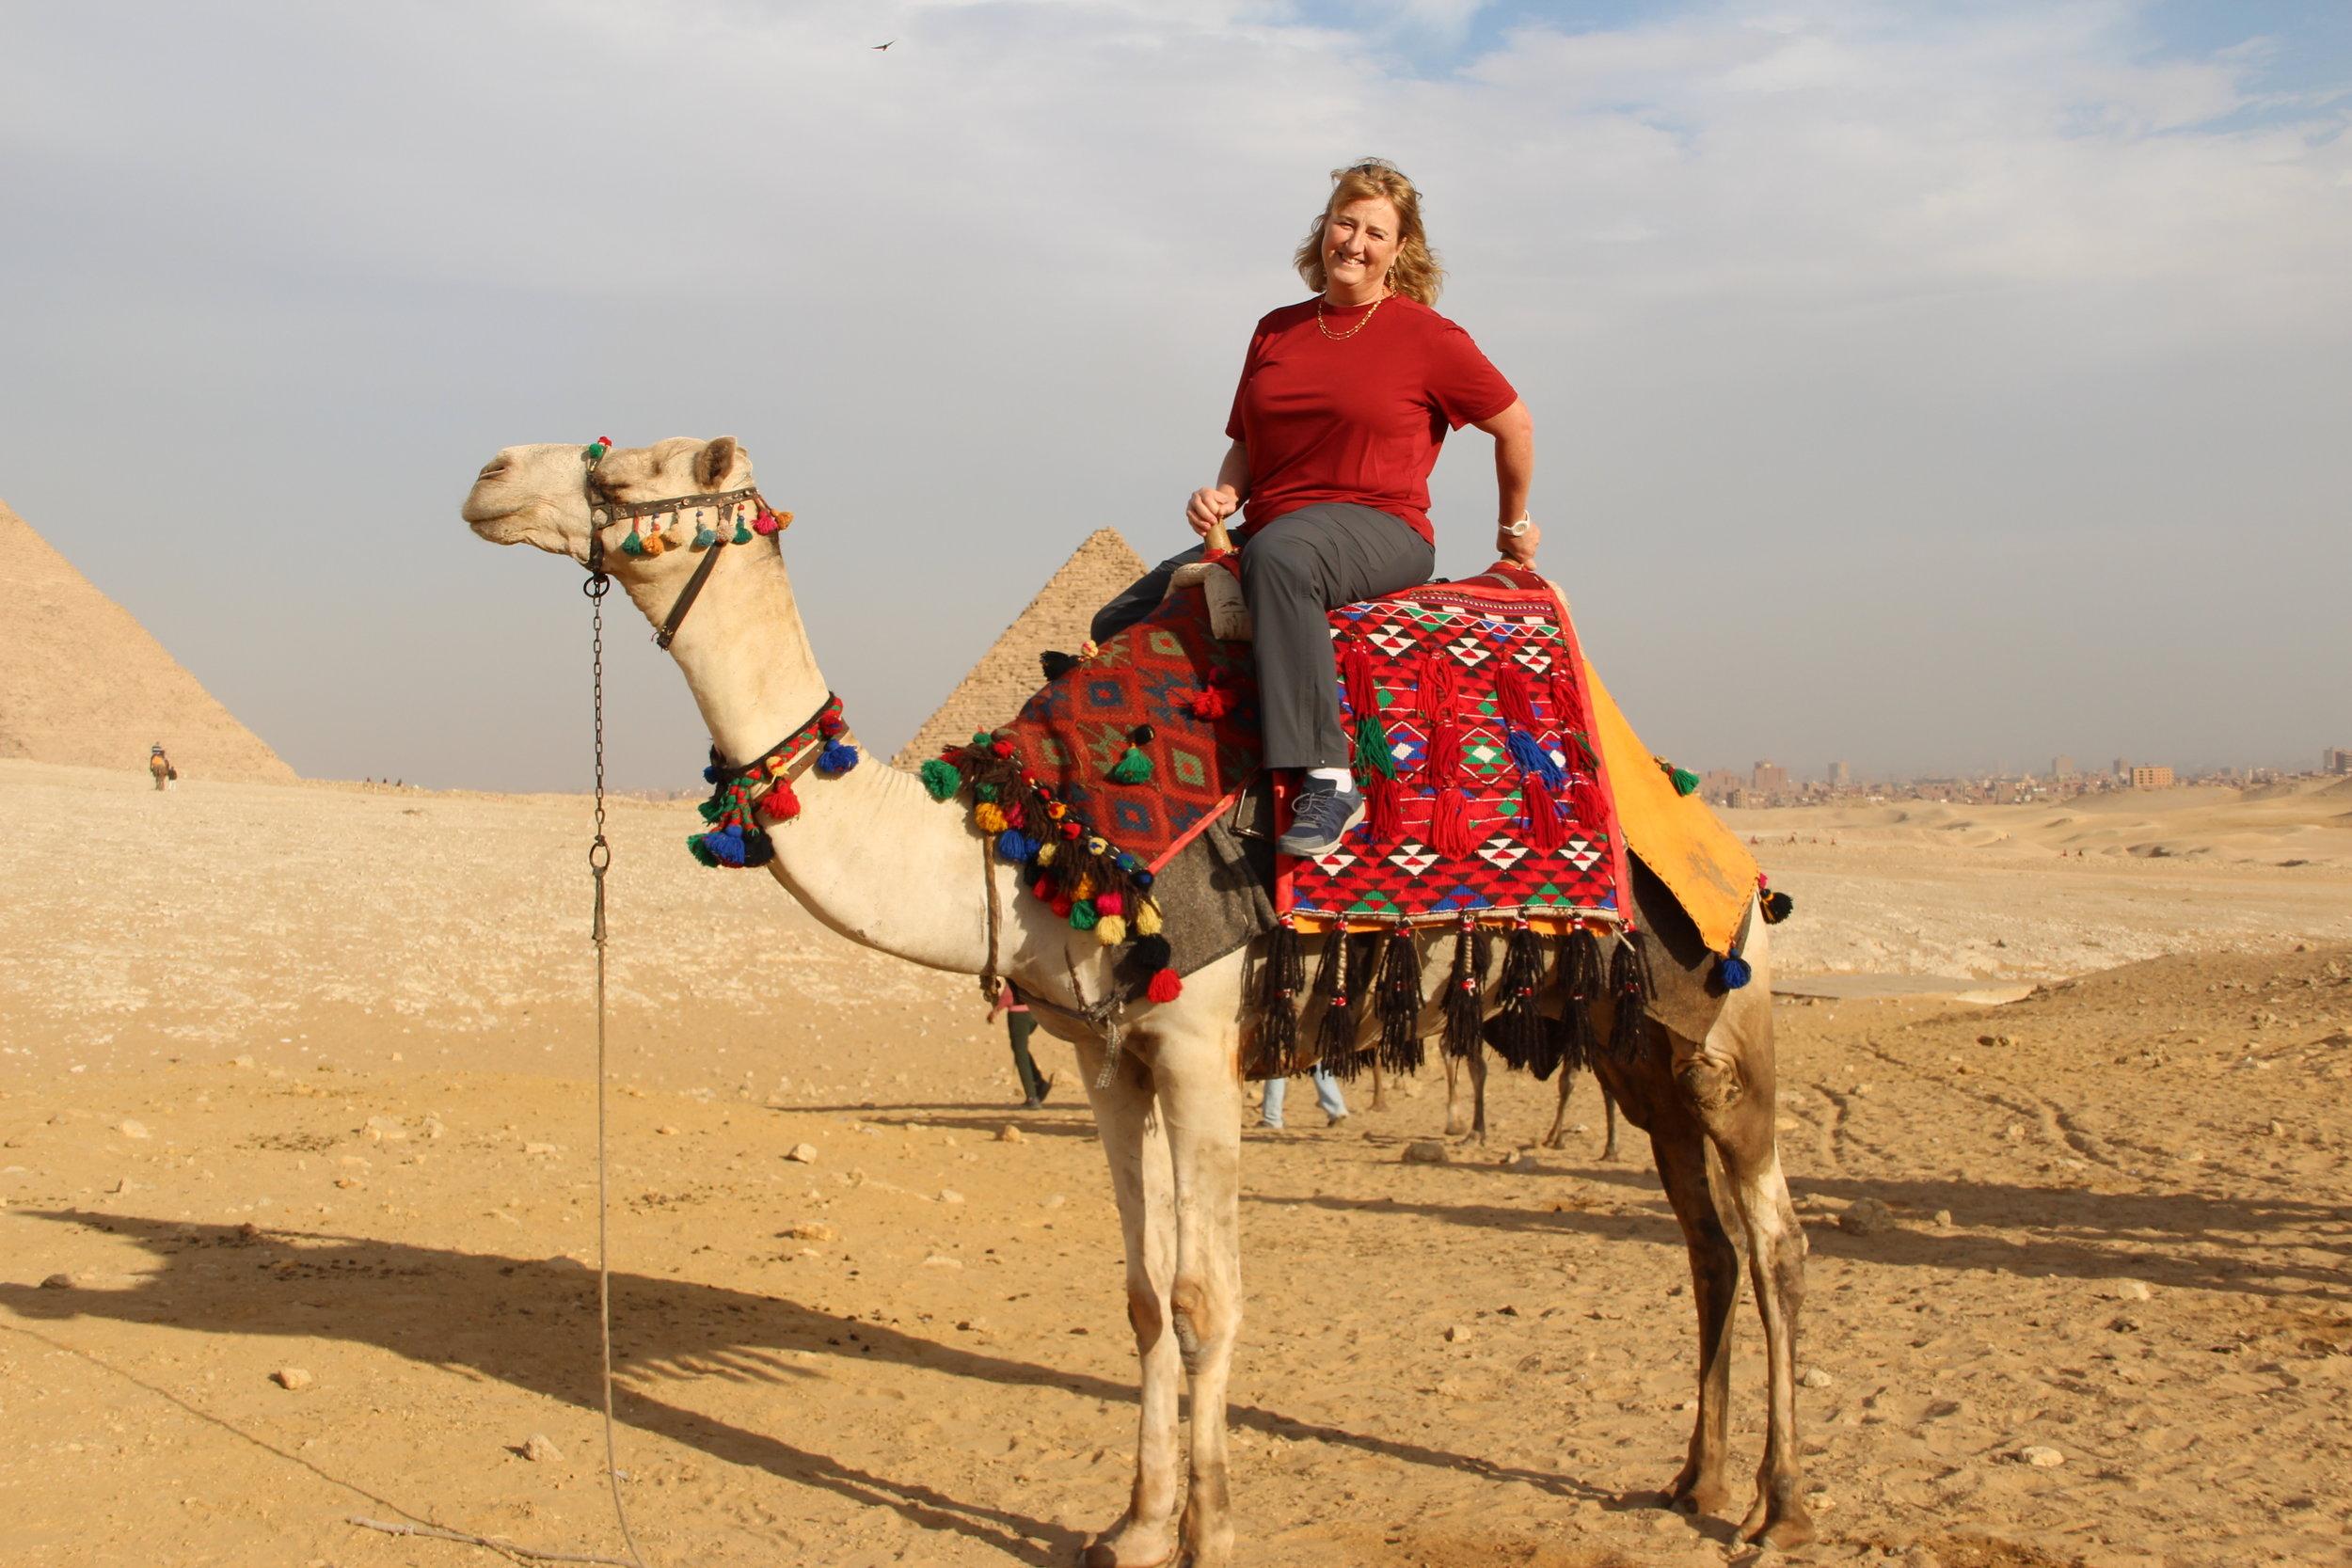 When in the desert...